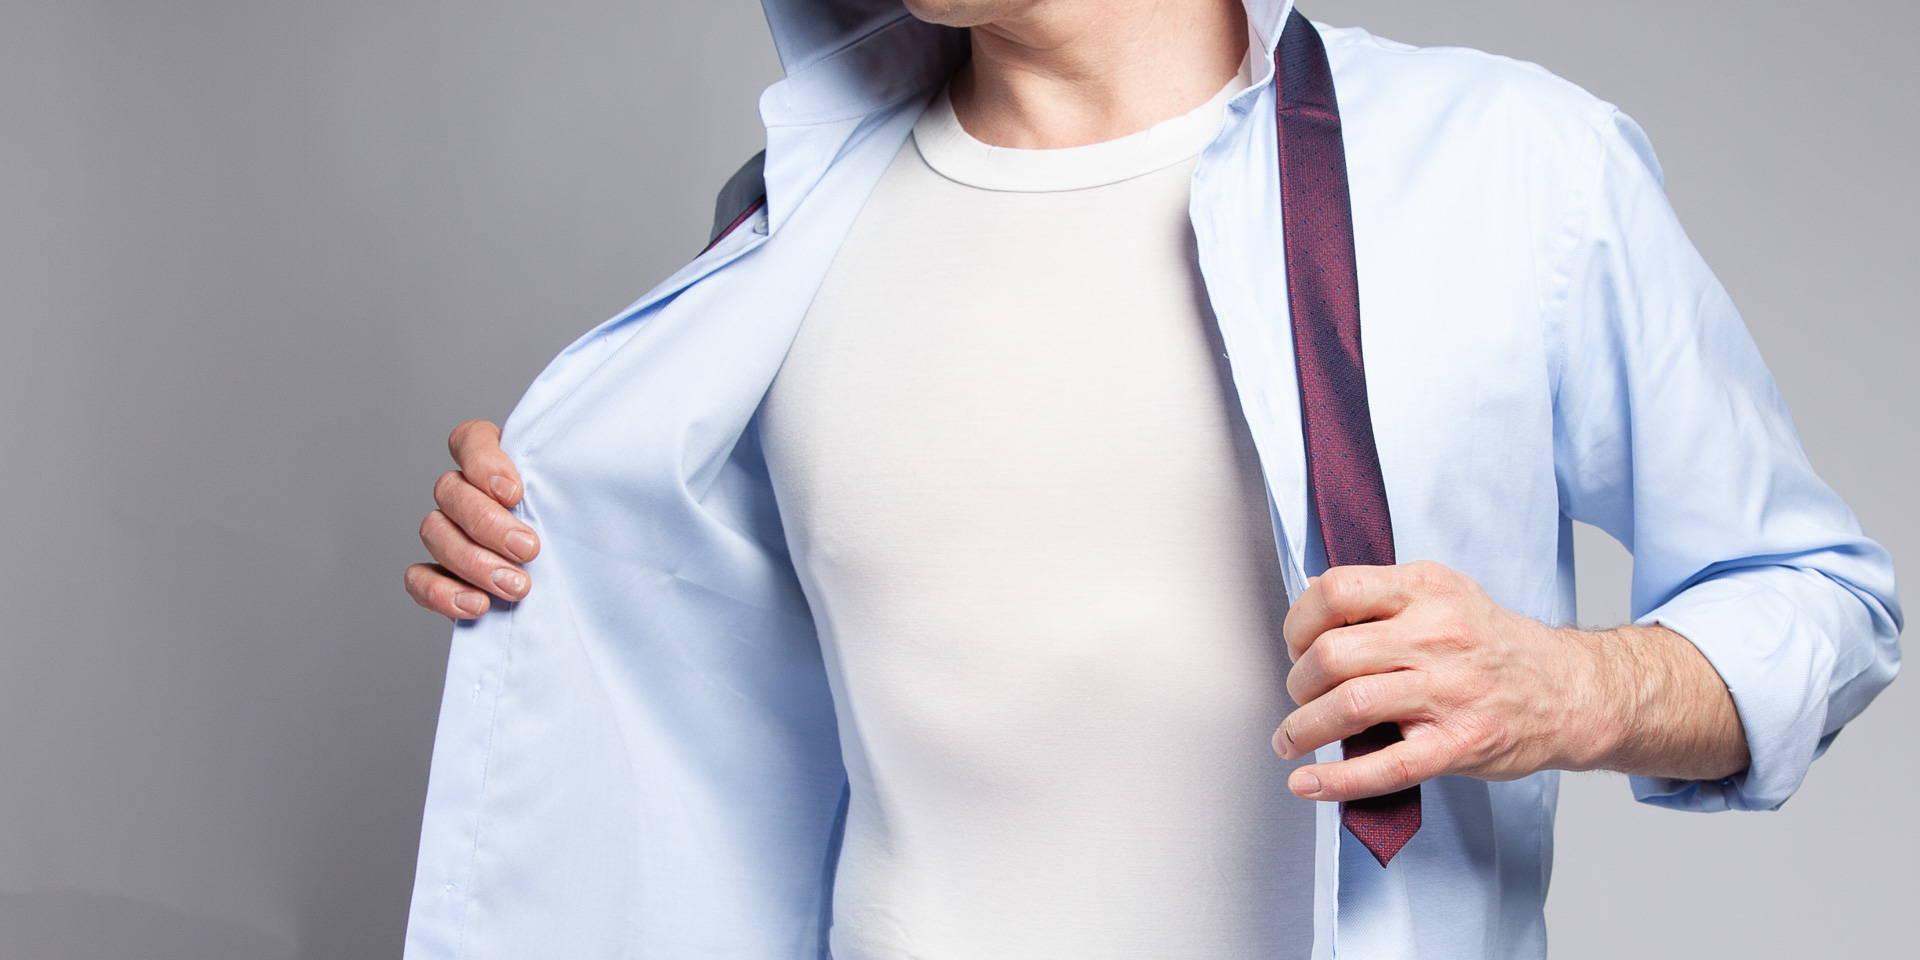 Man wearing white bamboo crew neck undershirt under a blue dress shirt and tie